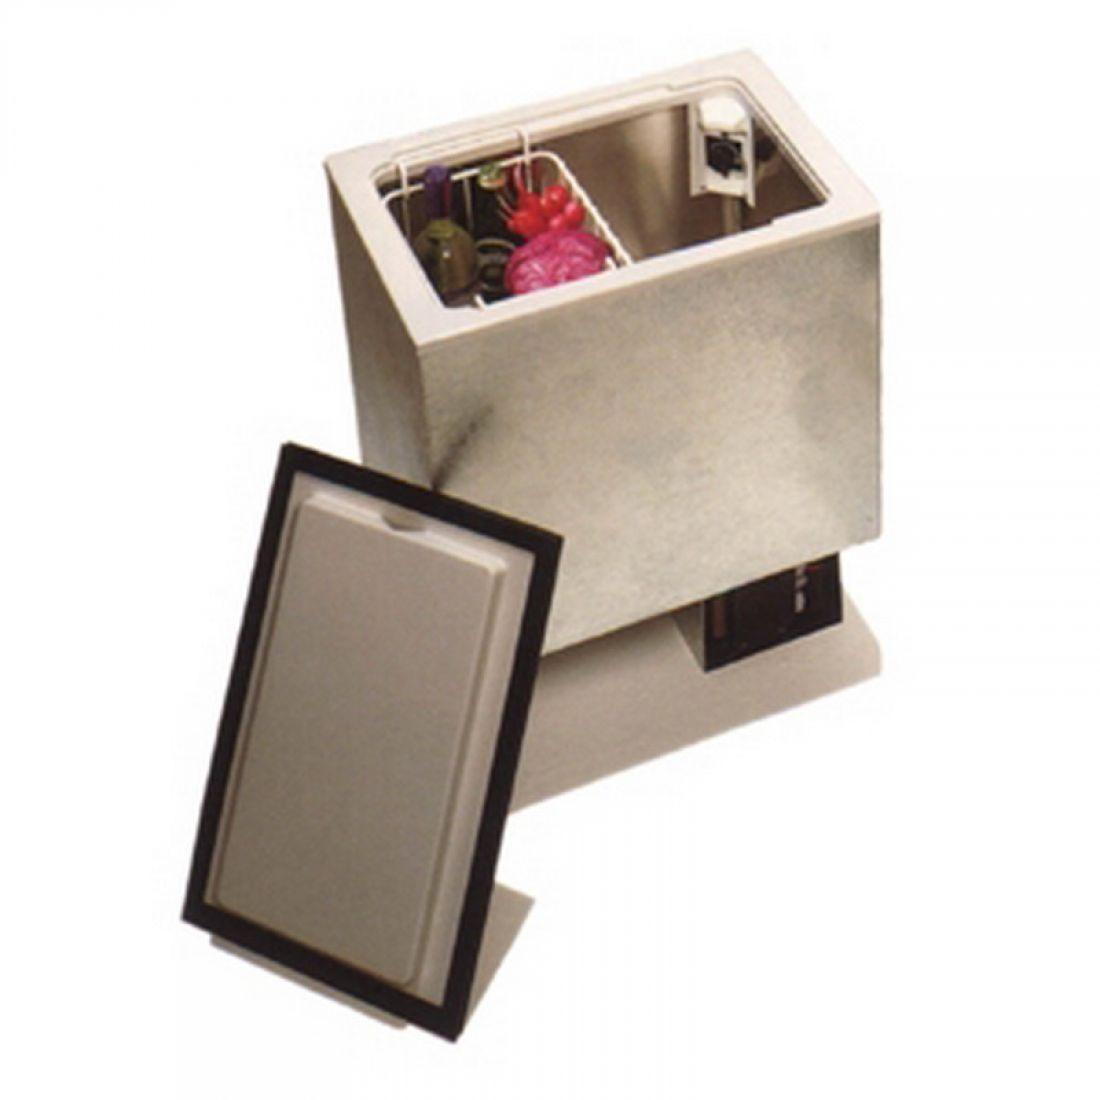 kb 43 ipt k hlbox fa kissmann ohne k ltespeicher. Black Bedroom Furniture Sets. Home Design Ideas